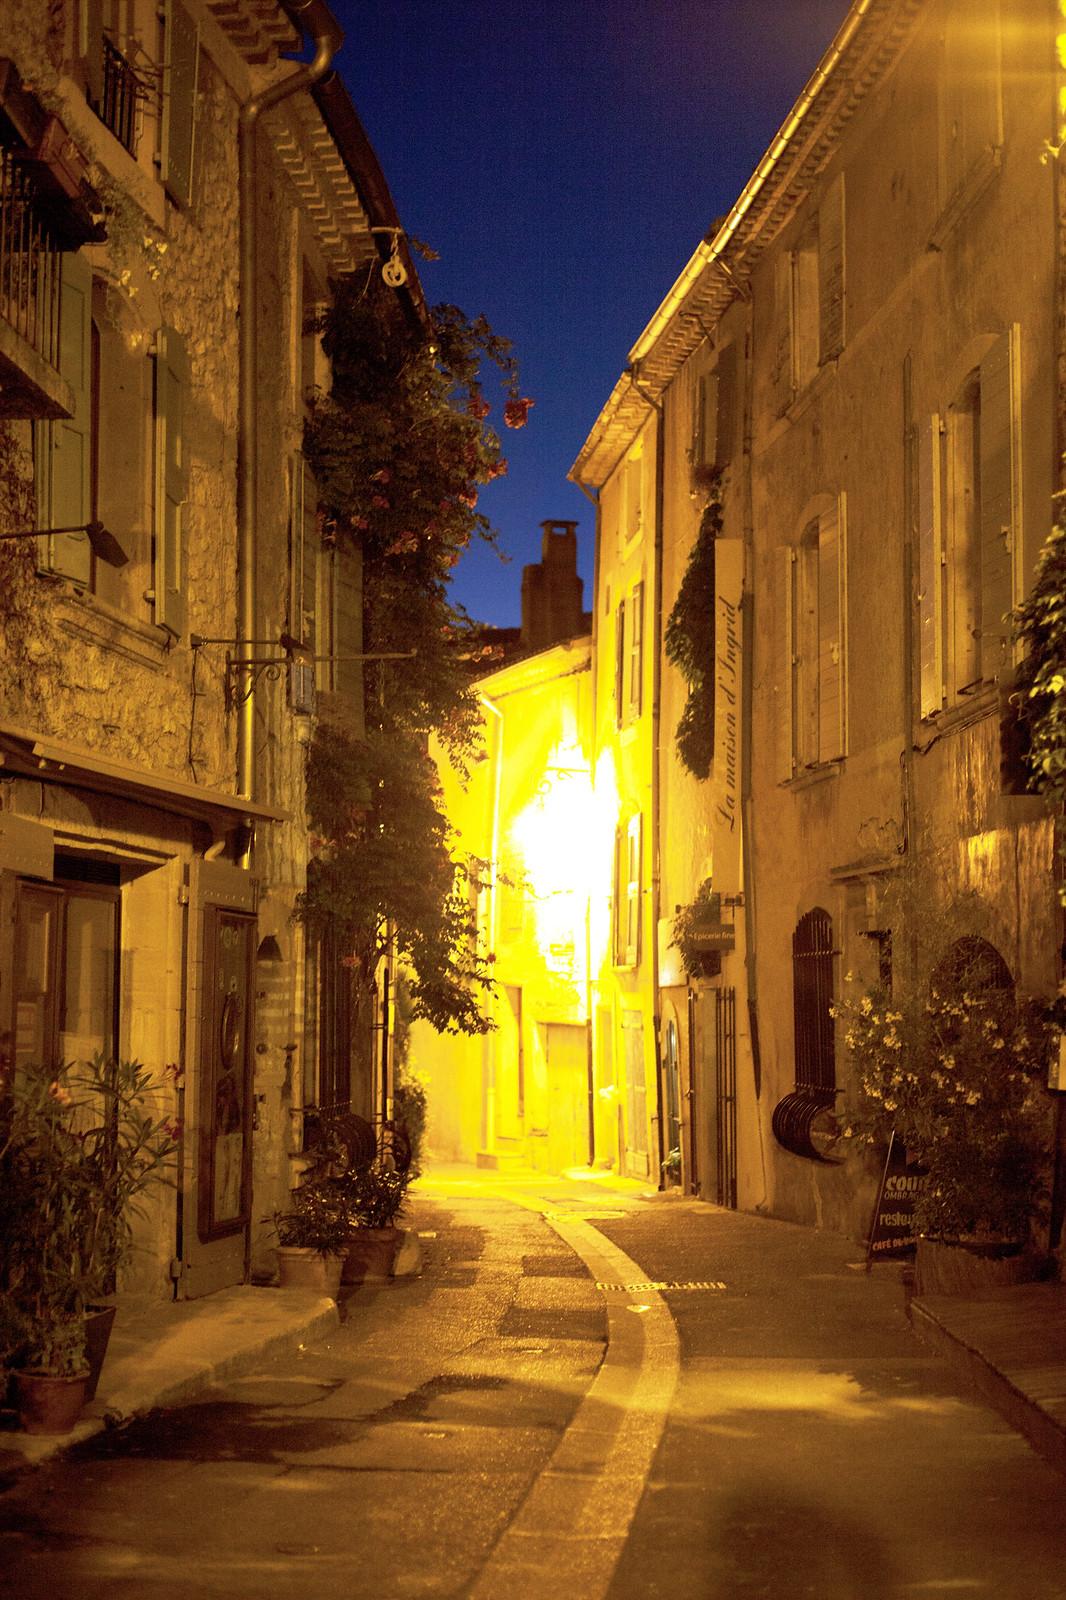 Lourmarin at night